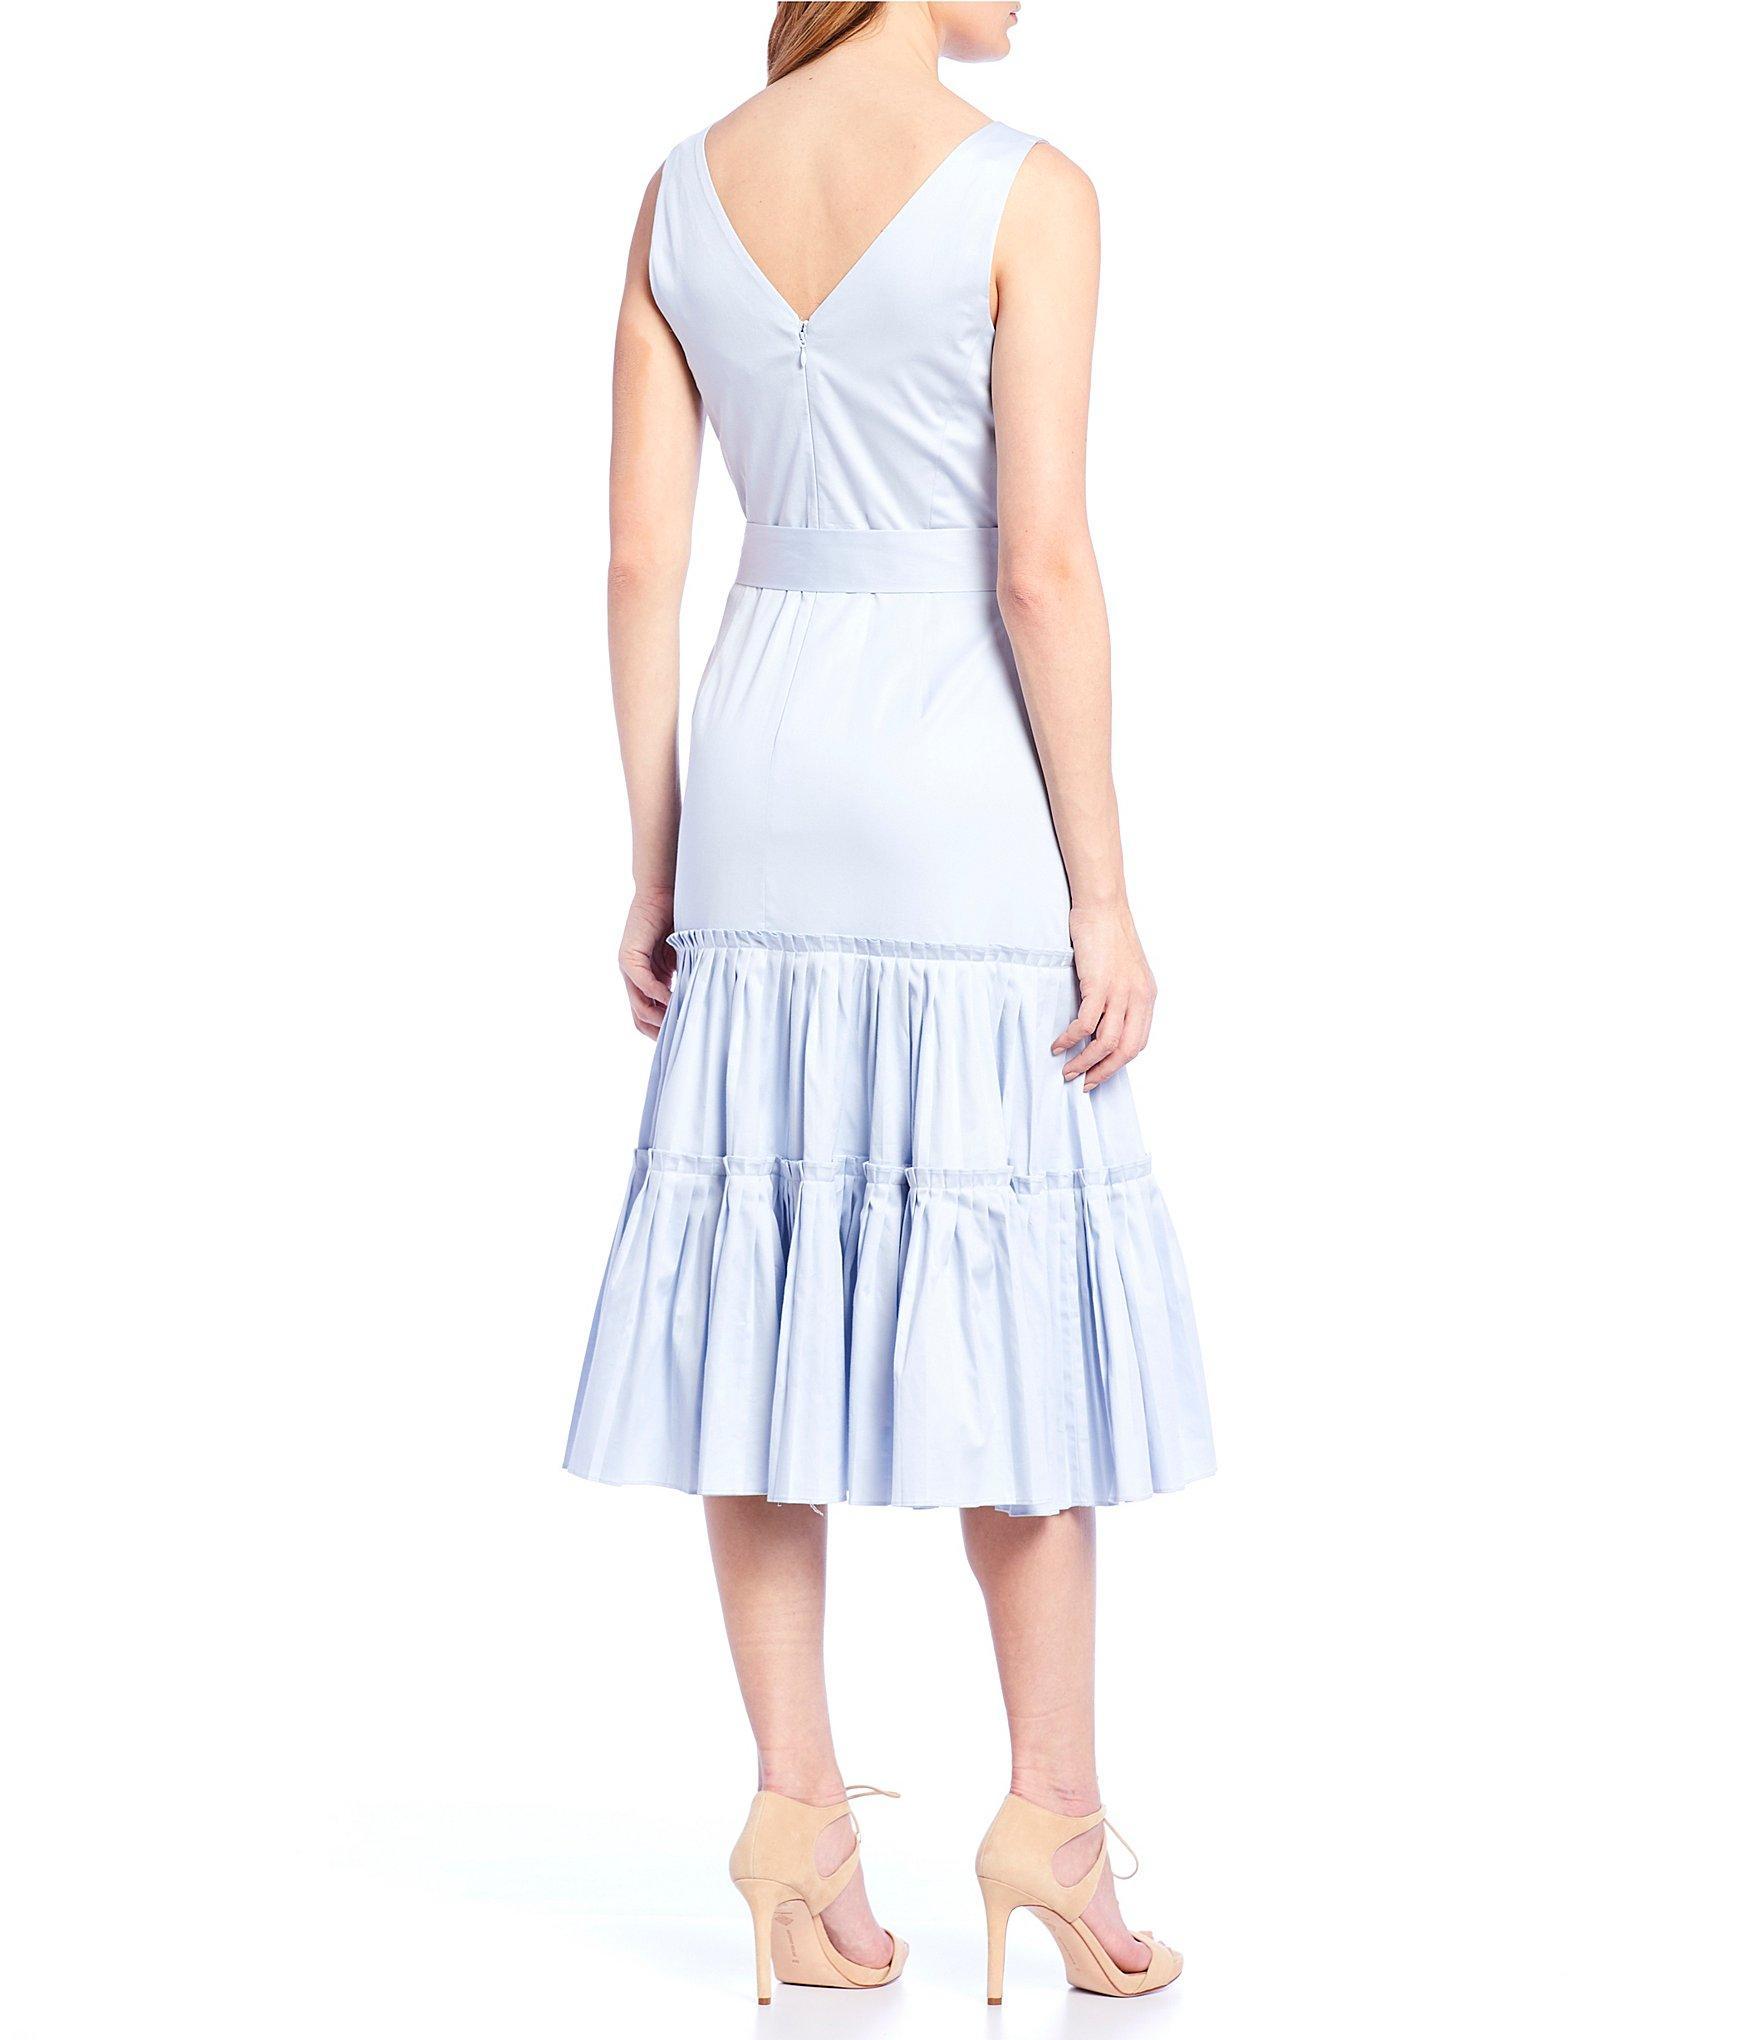 9e68297036b Lyst - Antonio Melani Sonia V-neck Tie Waist Tiered Ruffle A-line ...